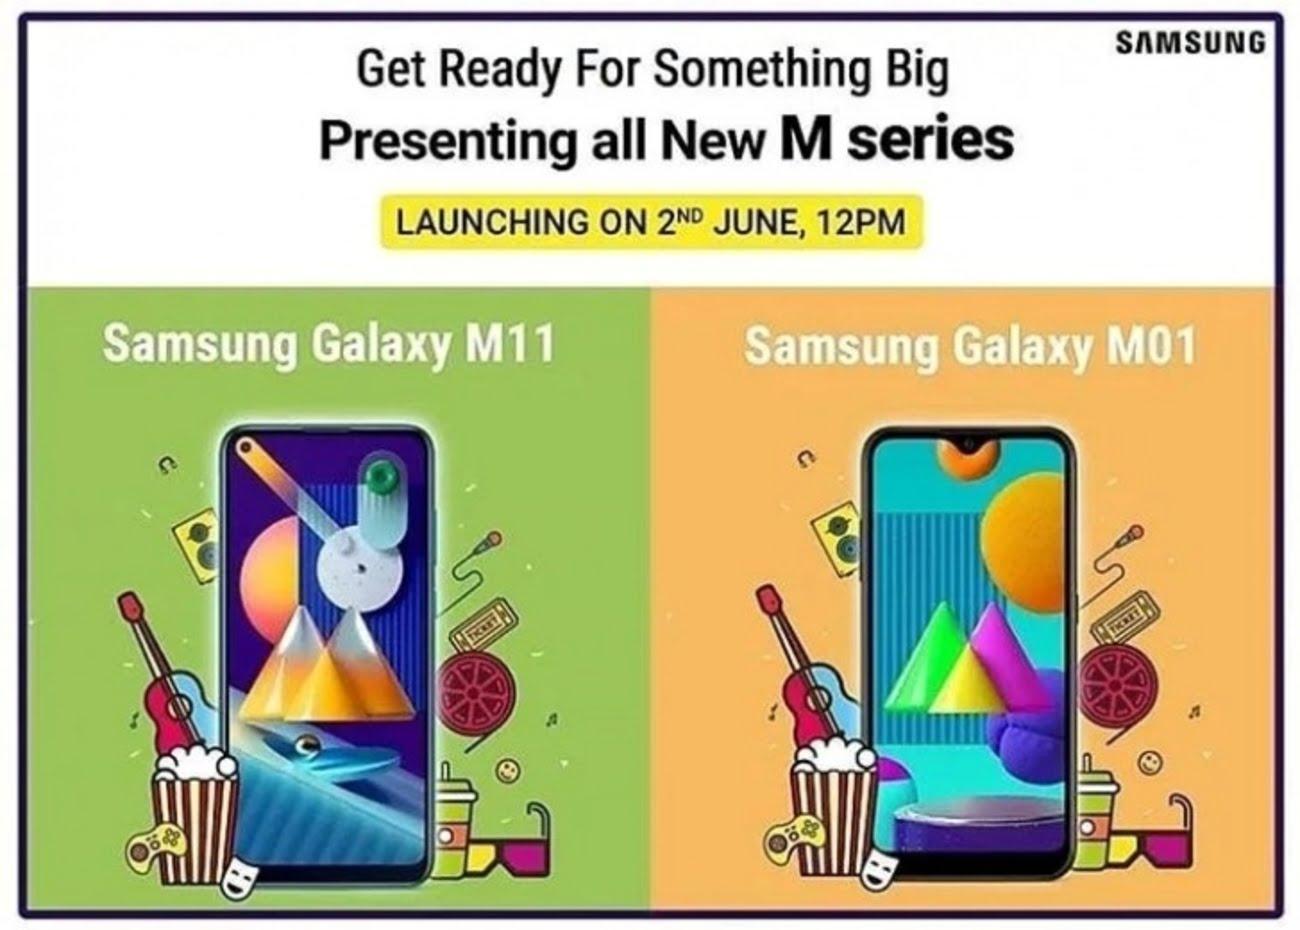 Samsung Galaxy M11 and M01 banner